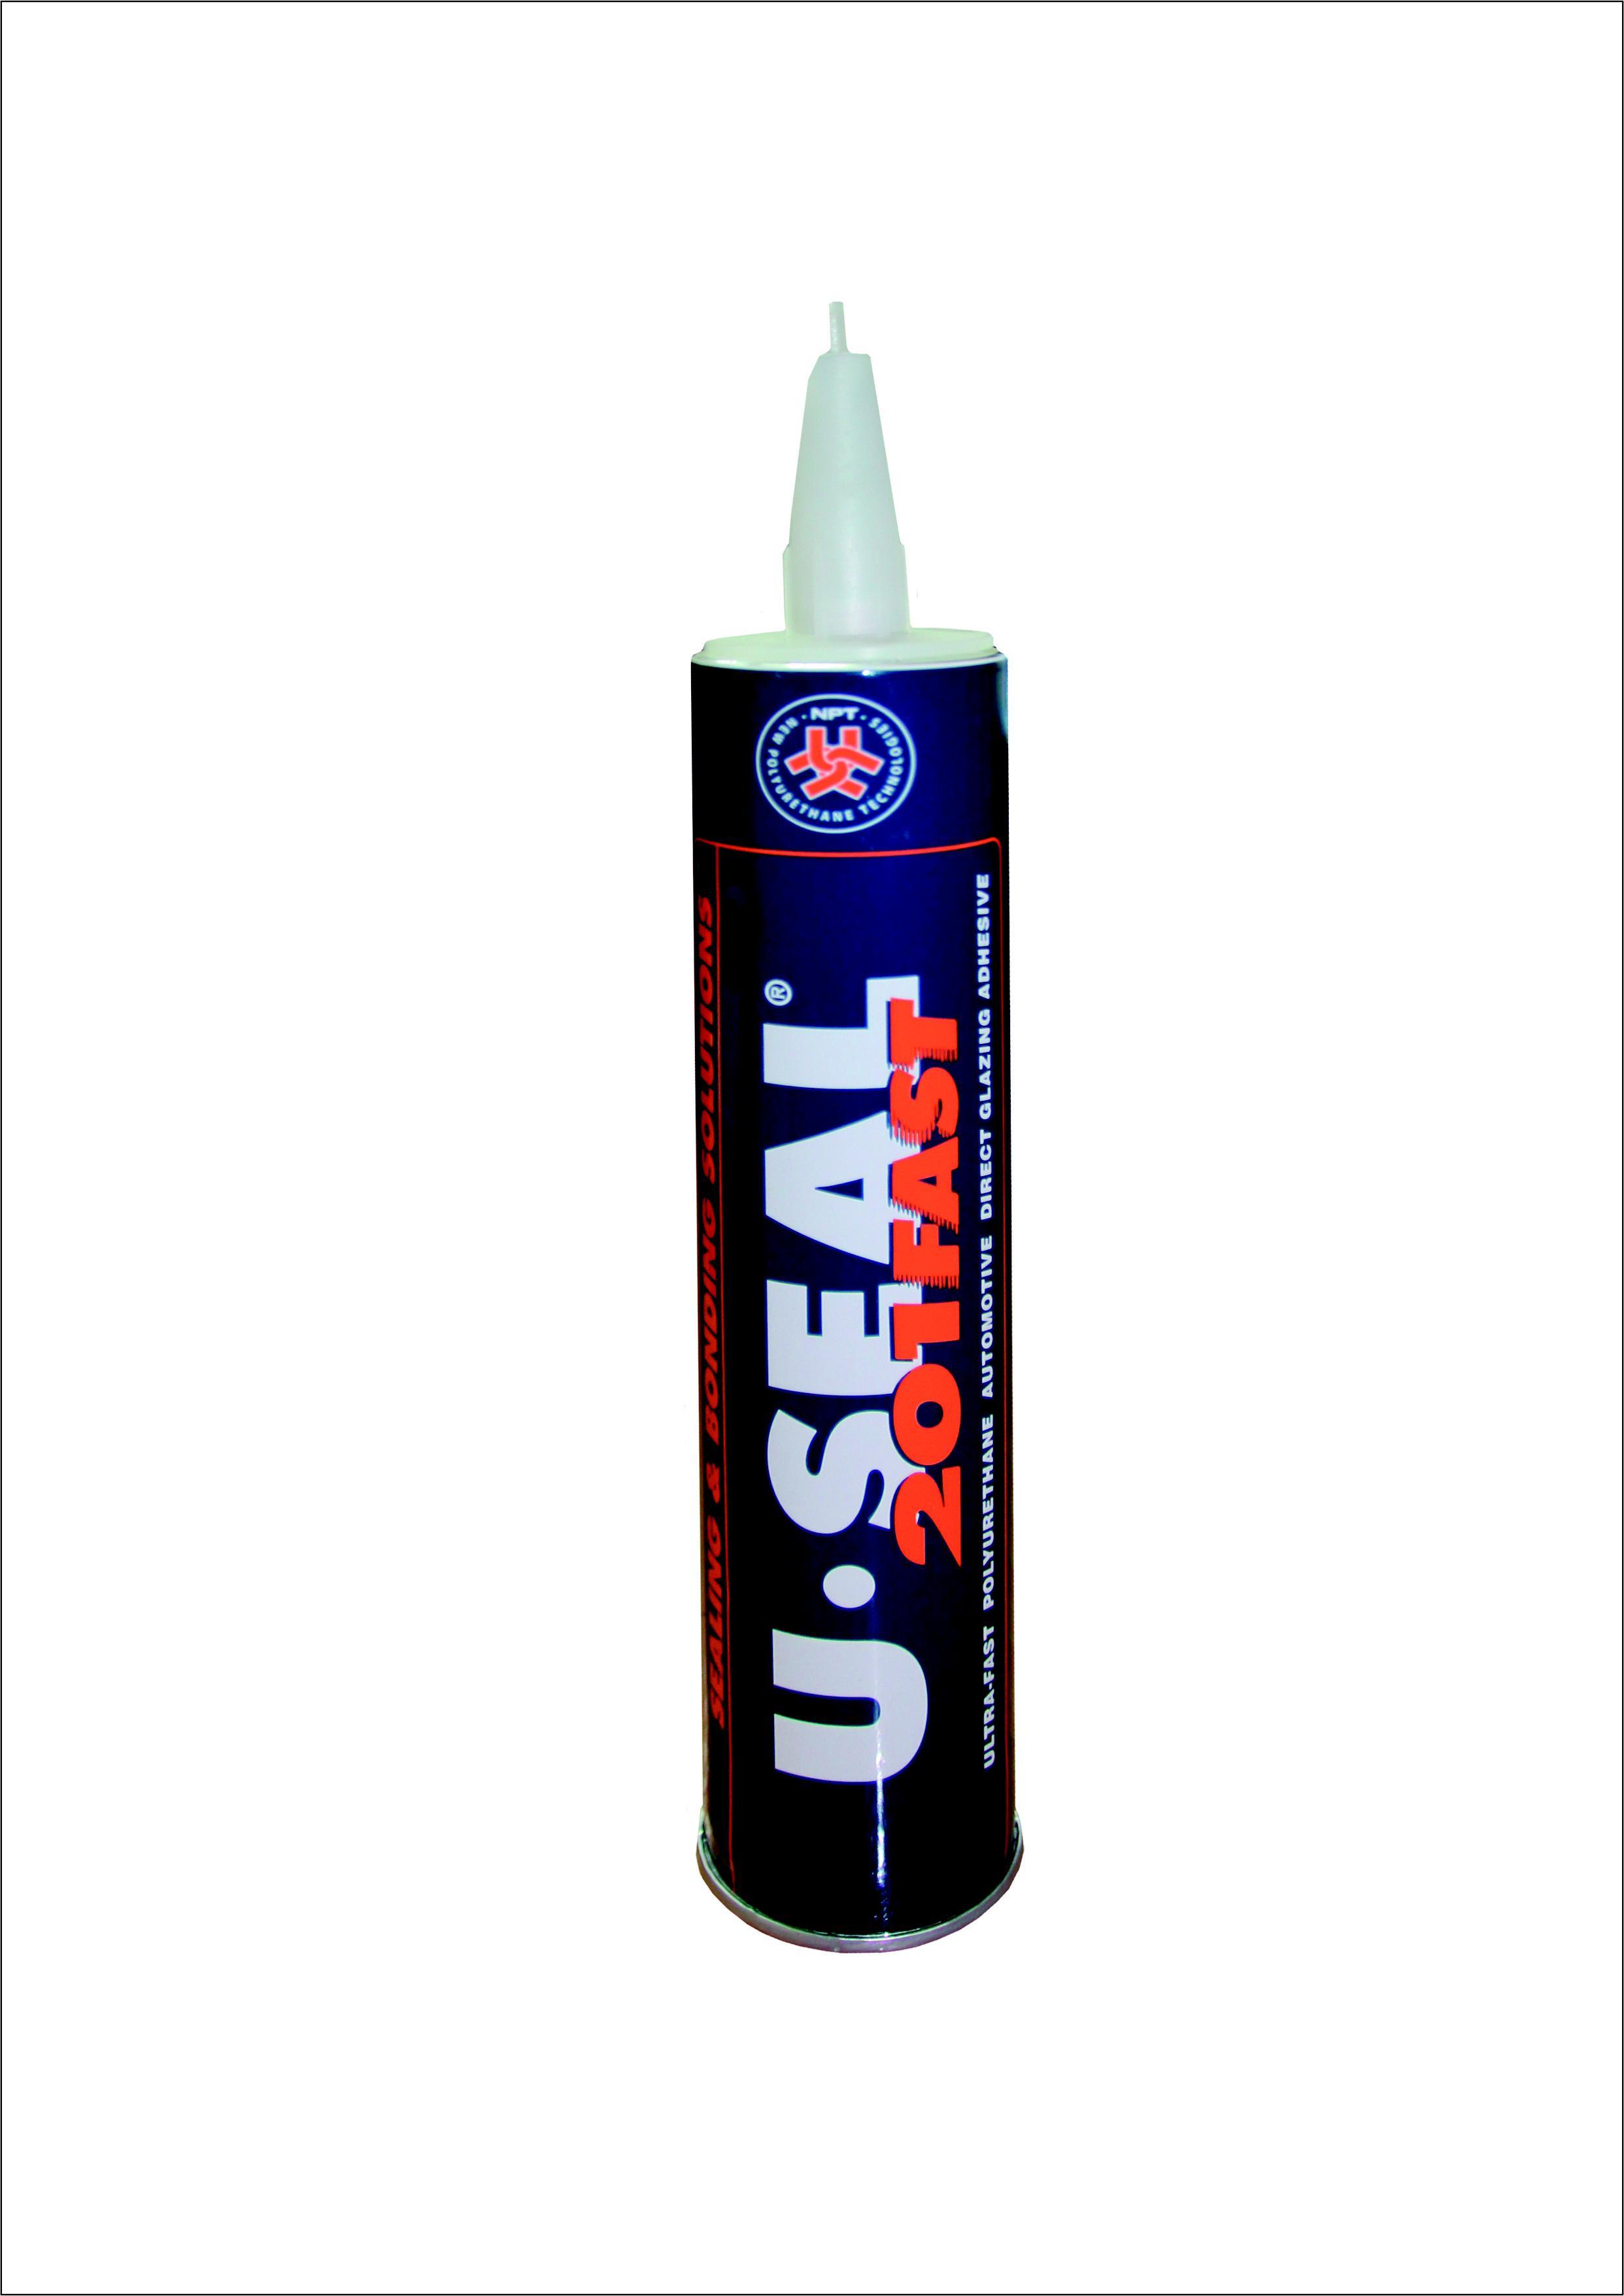 Клей U-seal 201 fast